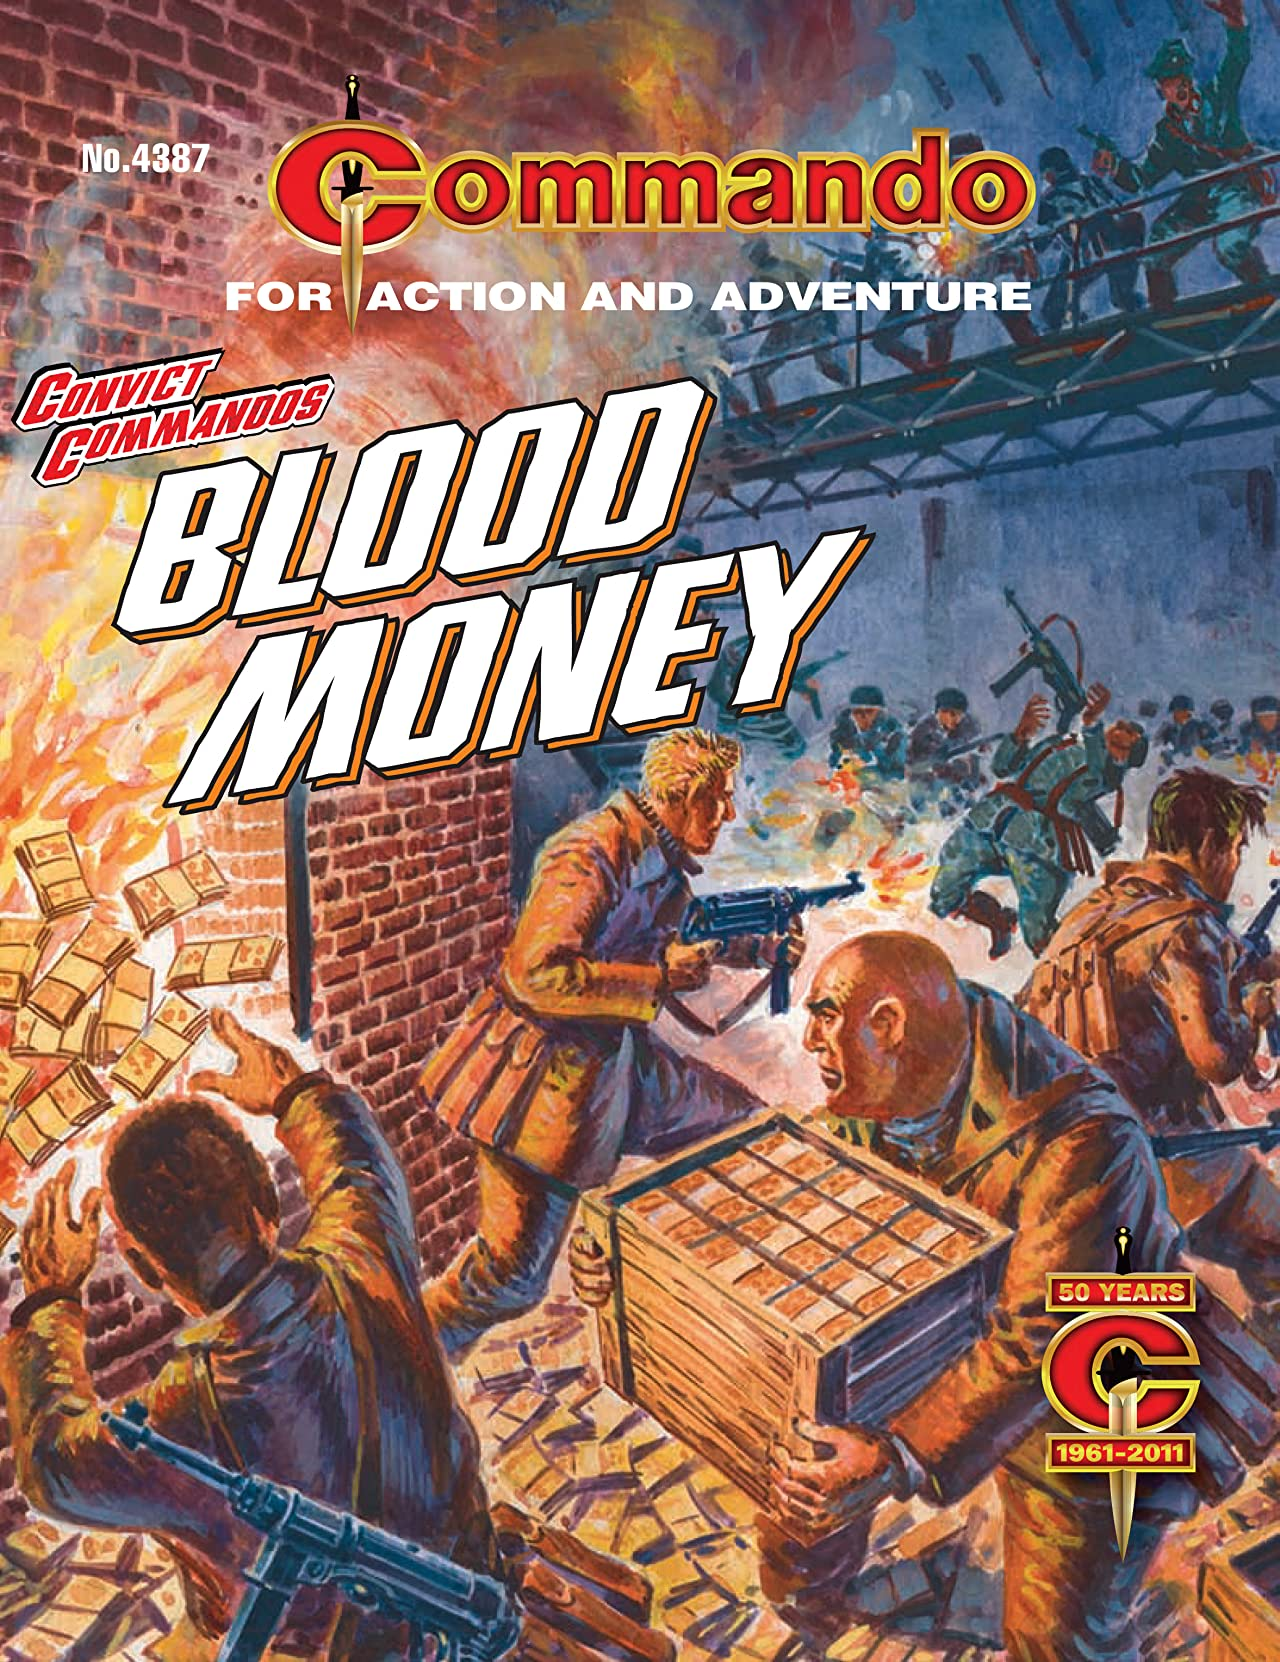 Commando #4387: Convict Commandos: Blood Money